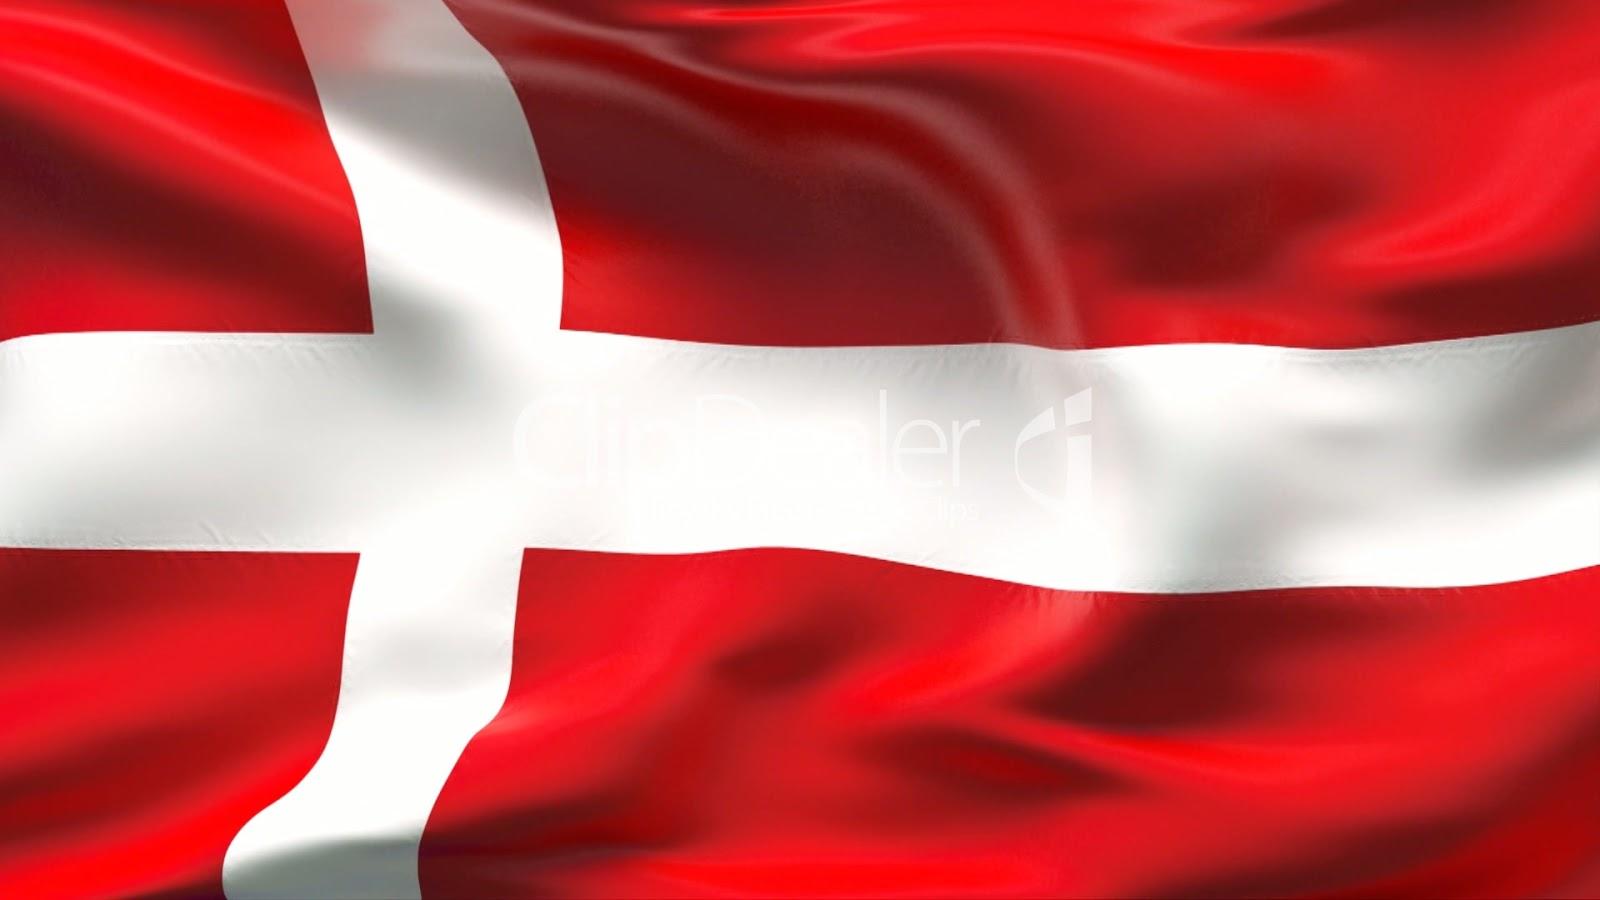 Iptv Denmark Channel Iptv Links Watch Iptv For Free